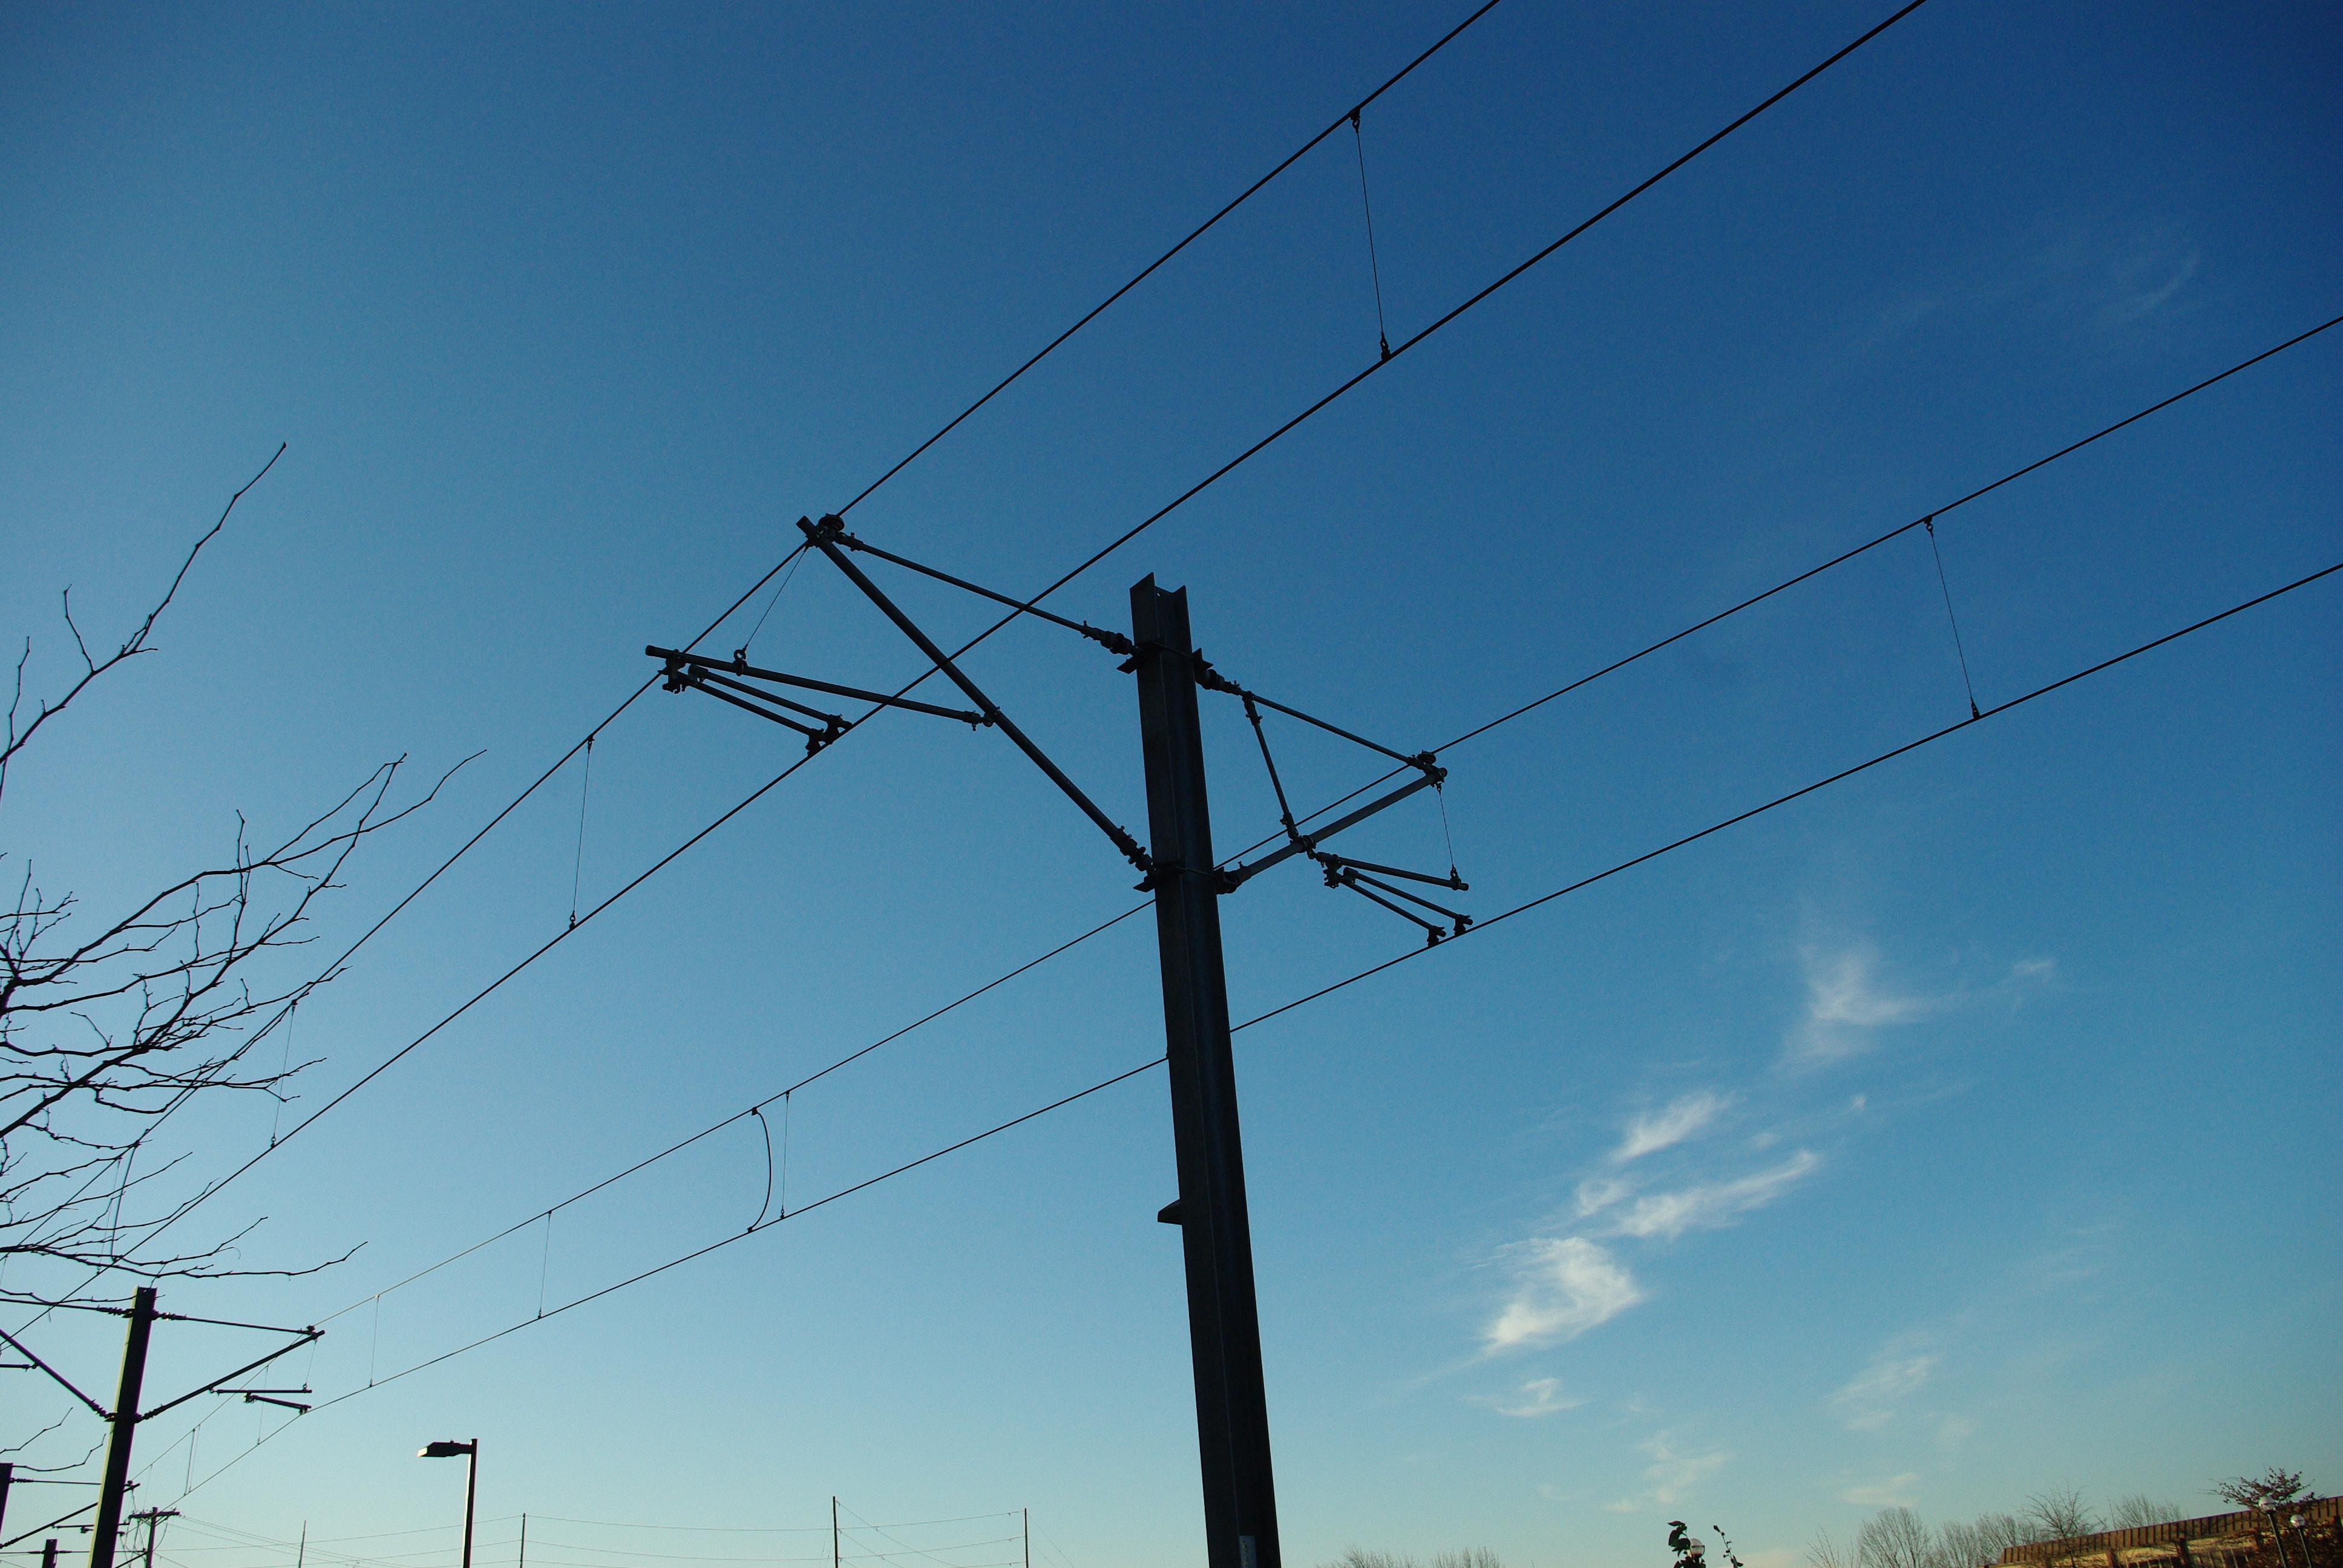 File:MAX light rail electricity line pole.JPG - Wikimedia ...